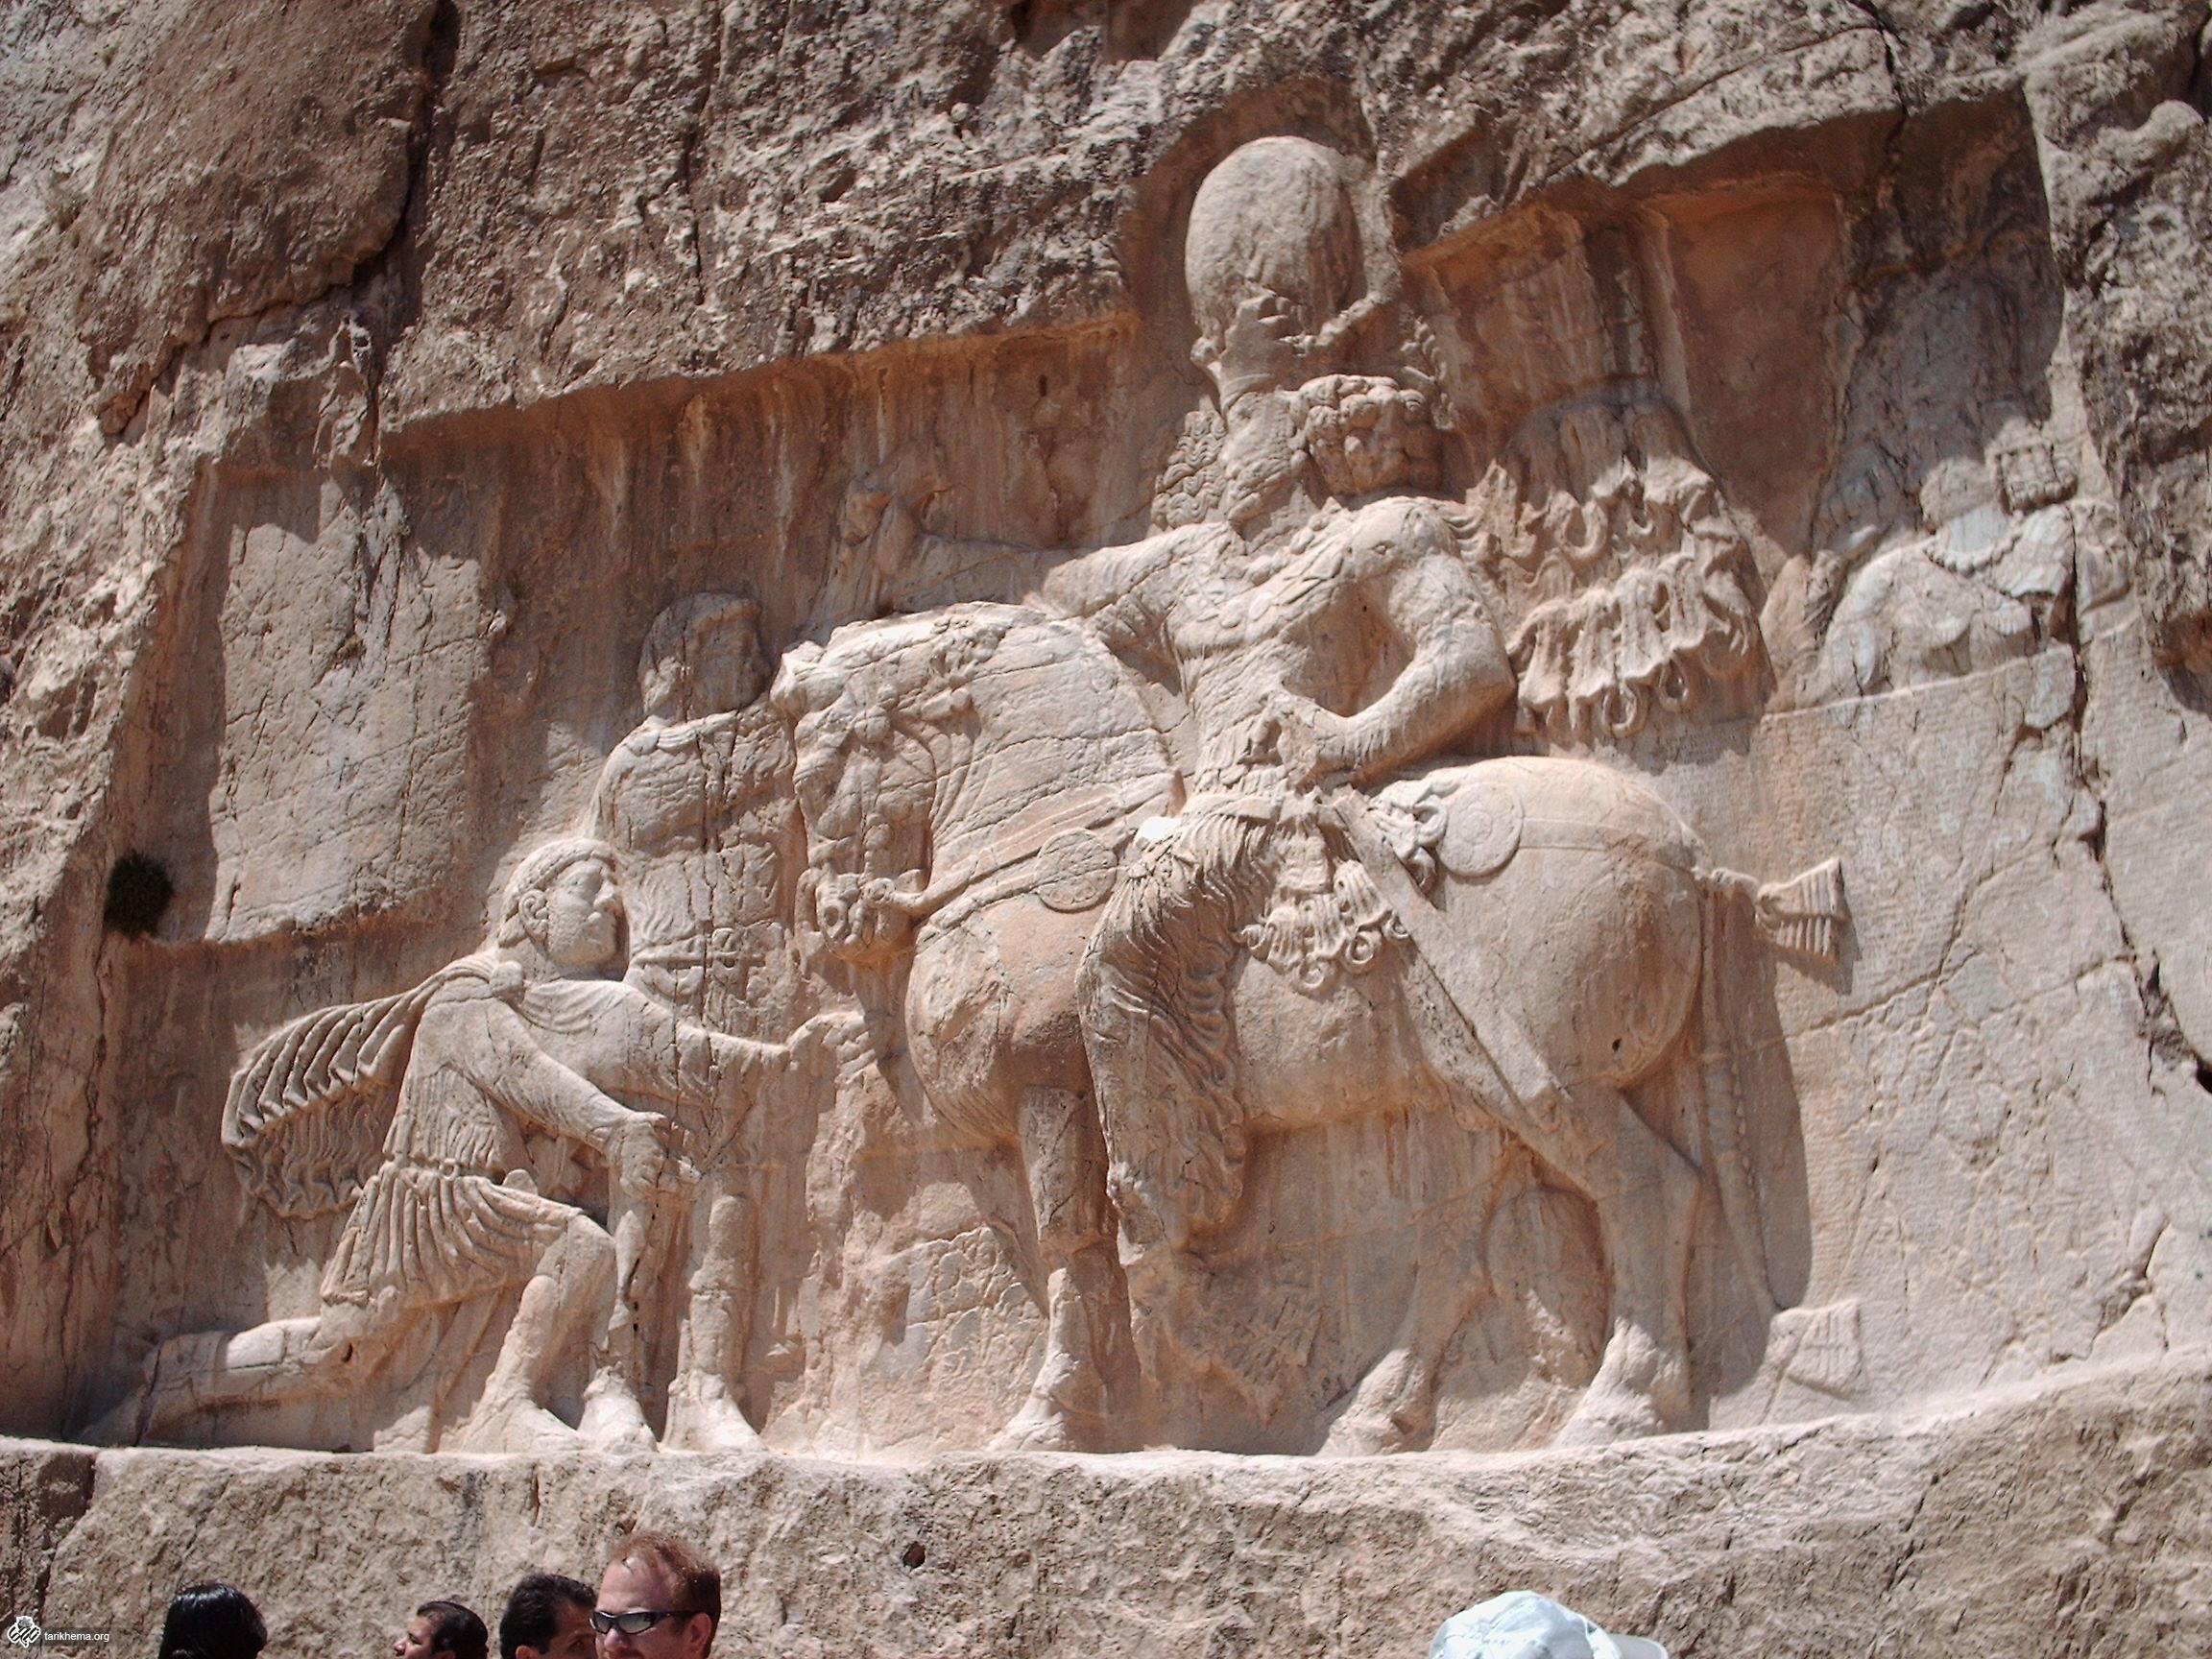 Naqsh-_e_Rostam_VI_relief_Shapur_Ist.jpg (2304×1728)